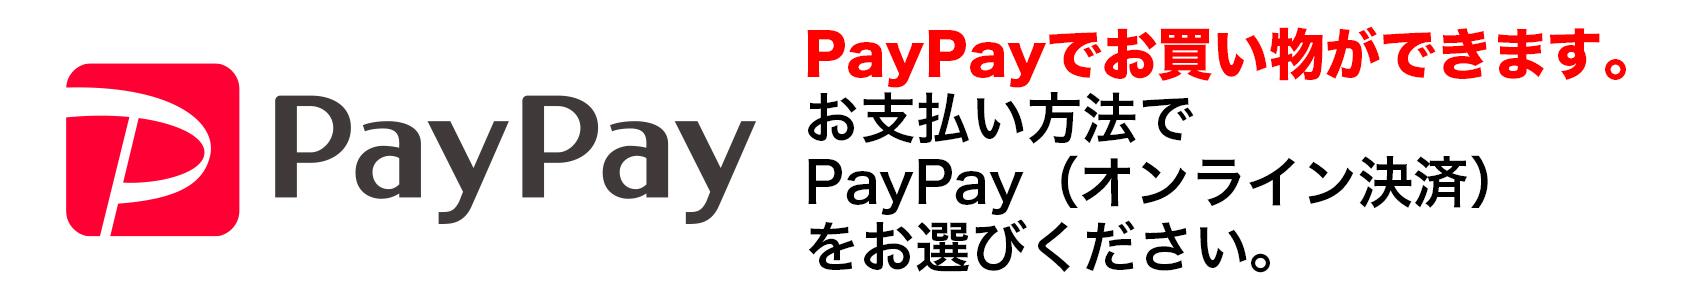 PayPay(オンライン決済)